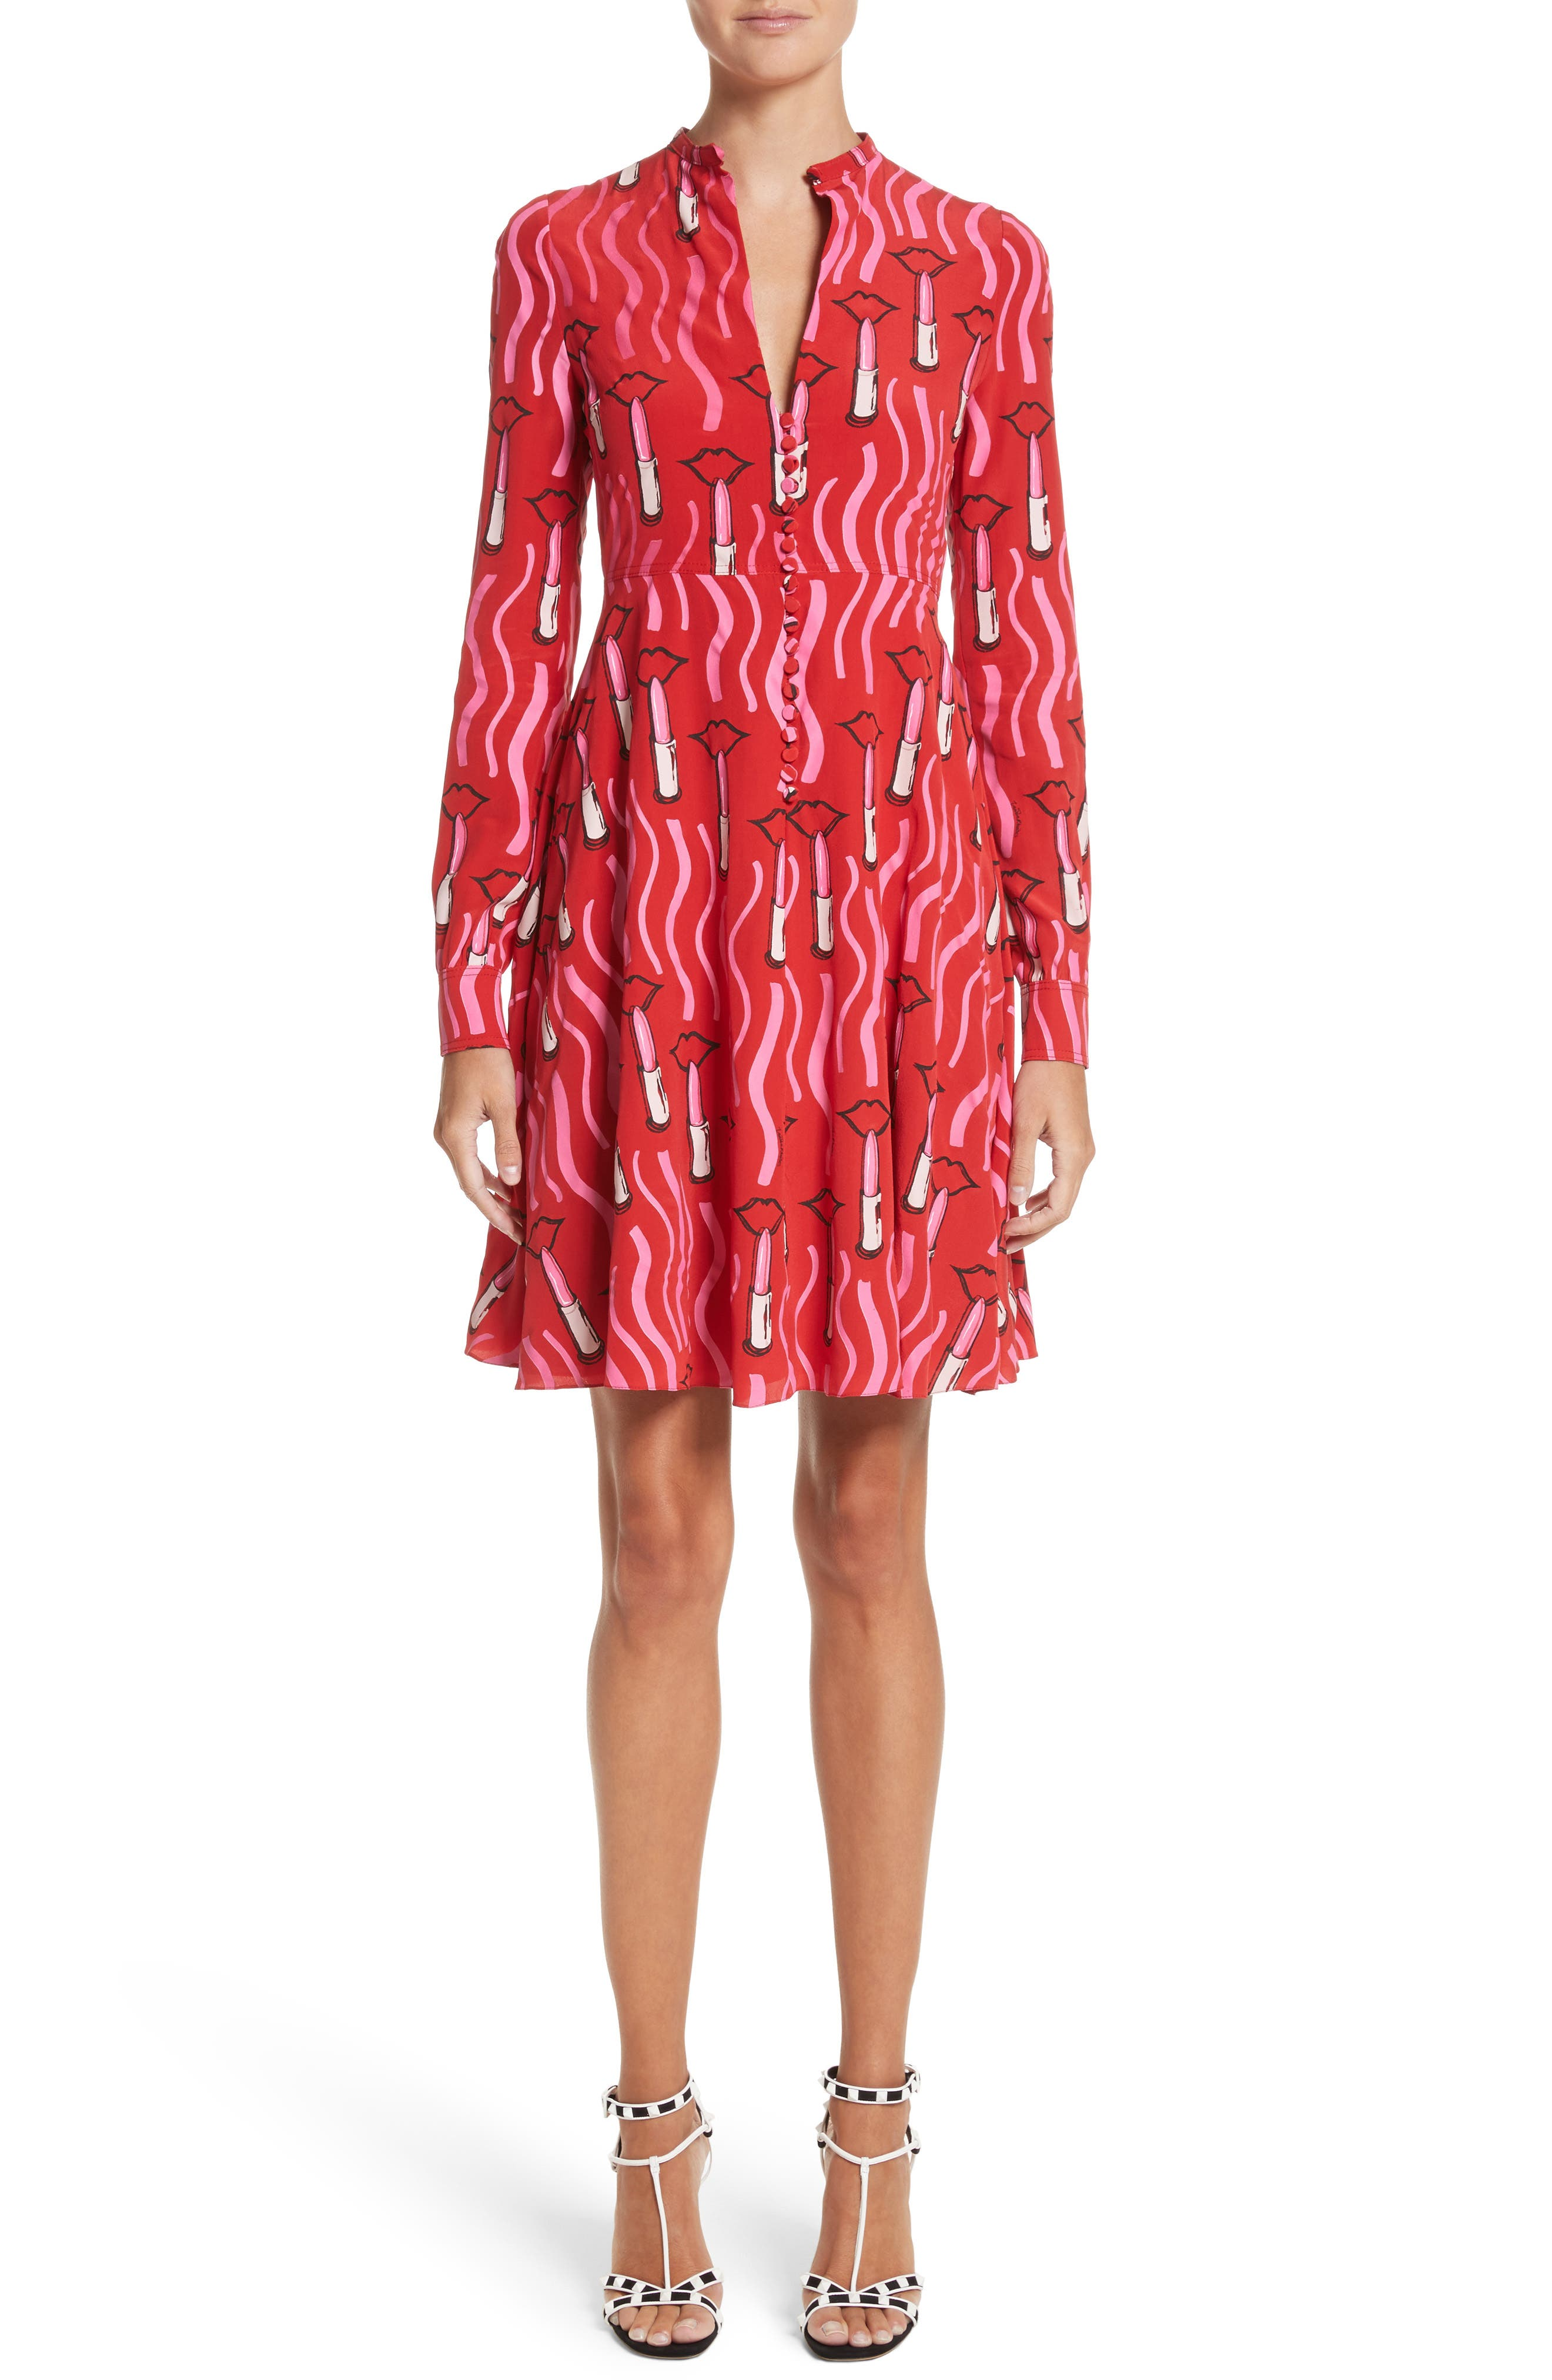 Valentino Lipstick Print Silk Fit & Flare Dress